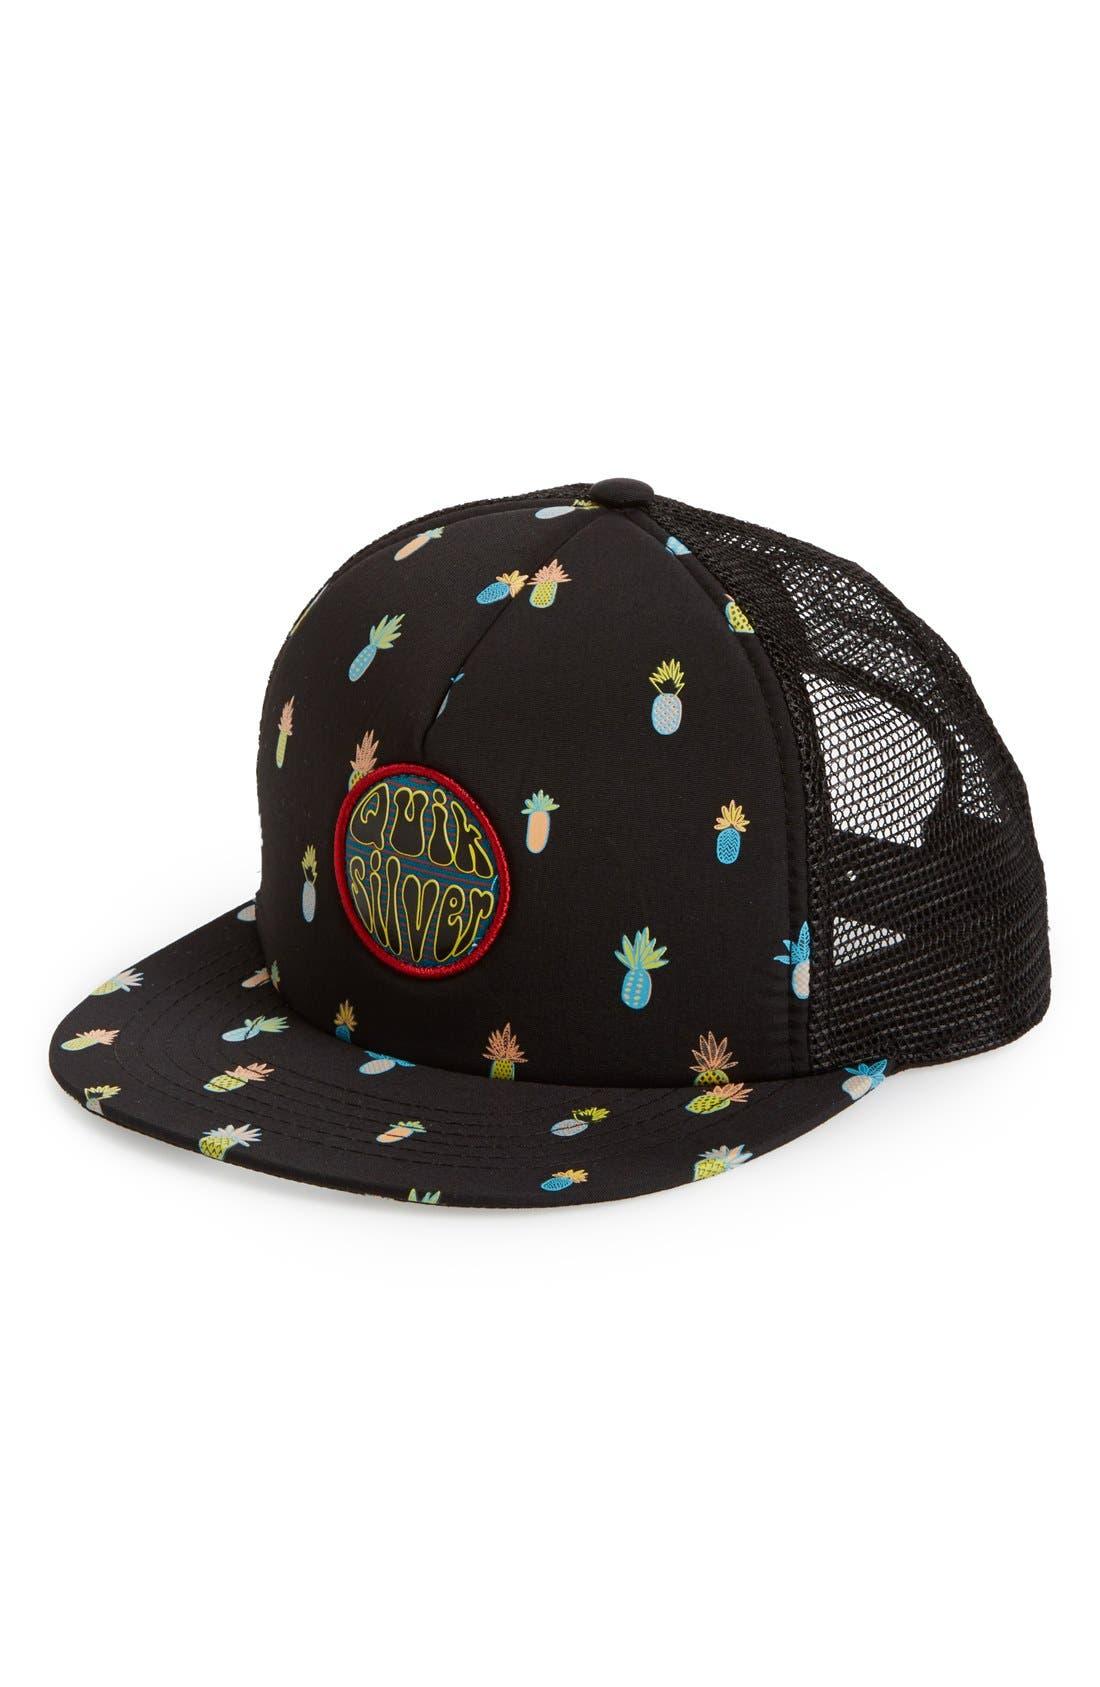 Alternate Image 1 Selected - Quiksilver 'Slash' Trucker Hat (Big Boys)